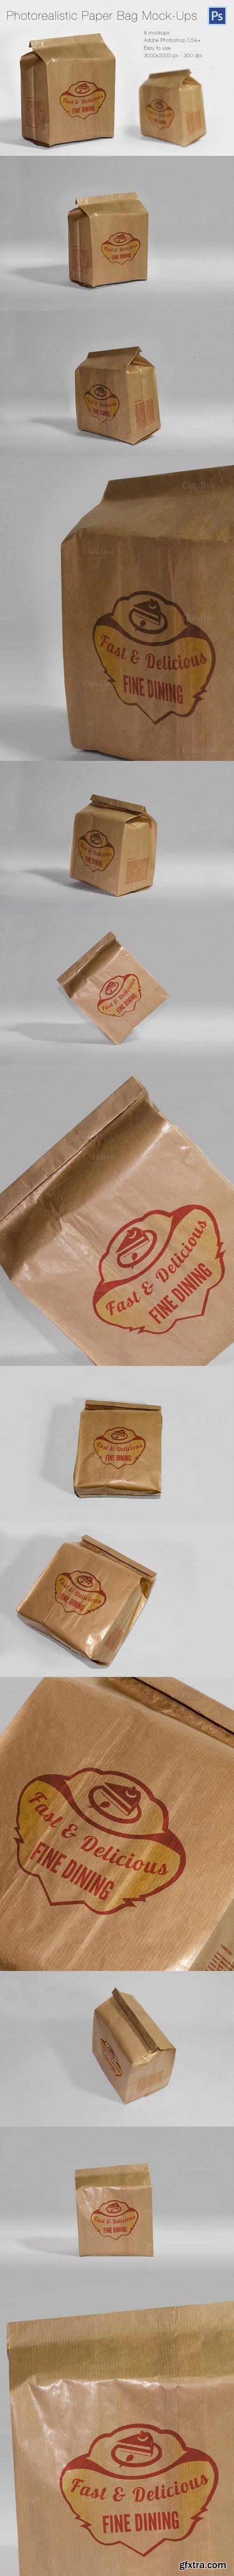 CM - Photorealistic Paper Bag Mock-Ups 416368